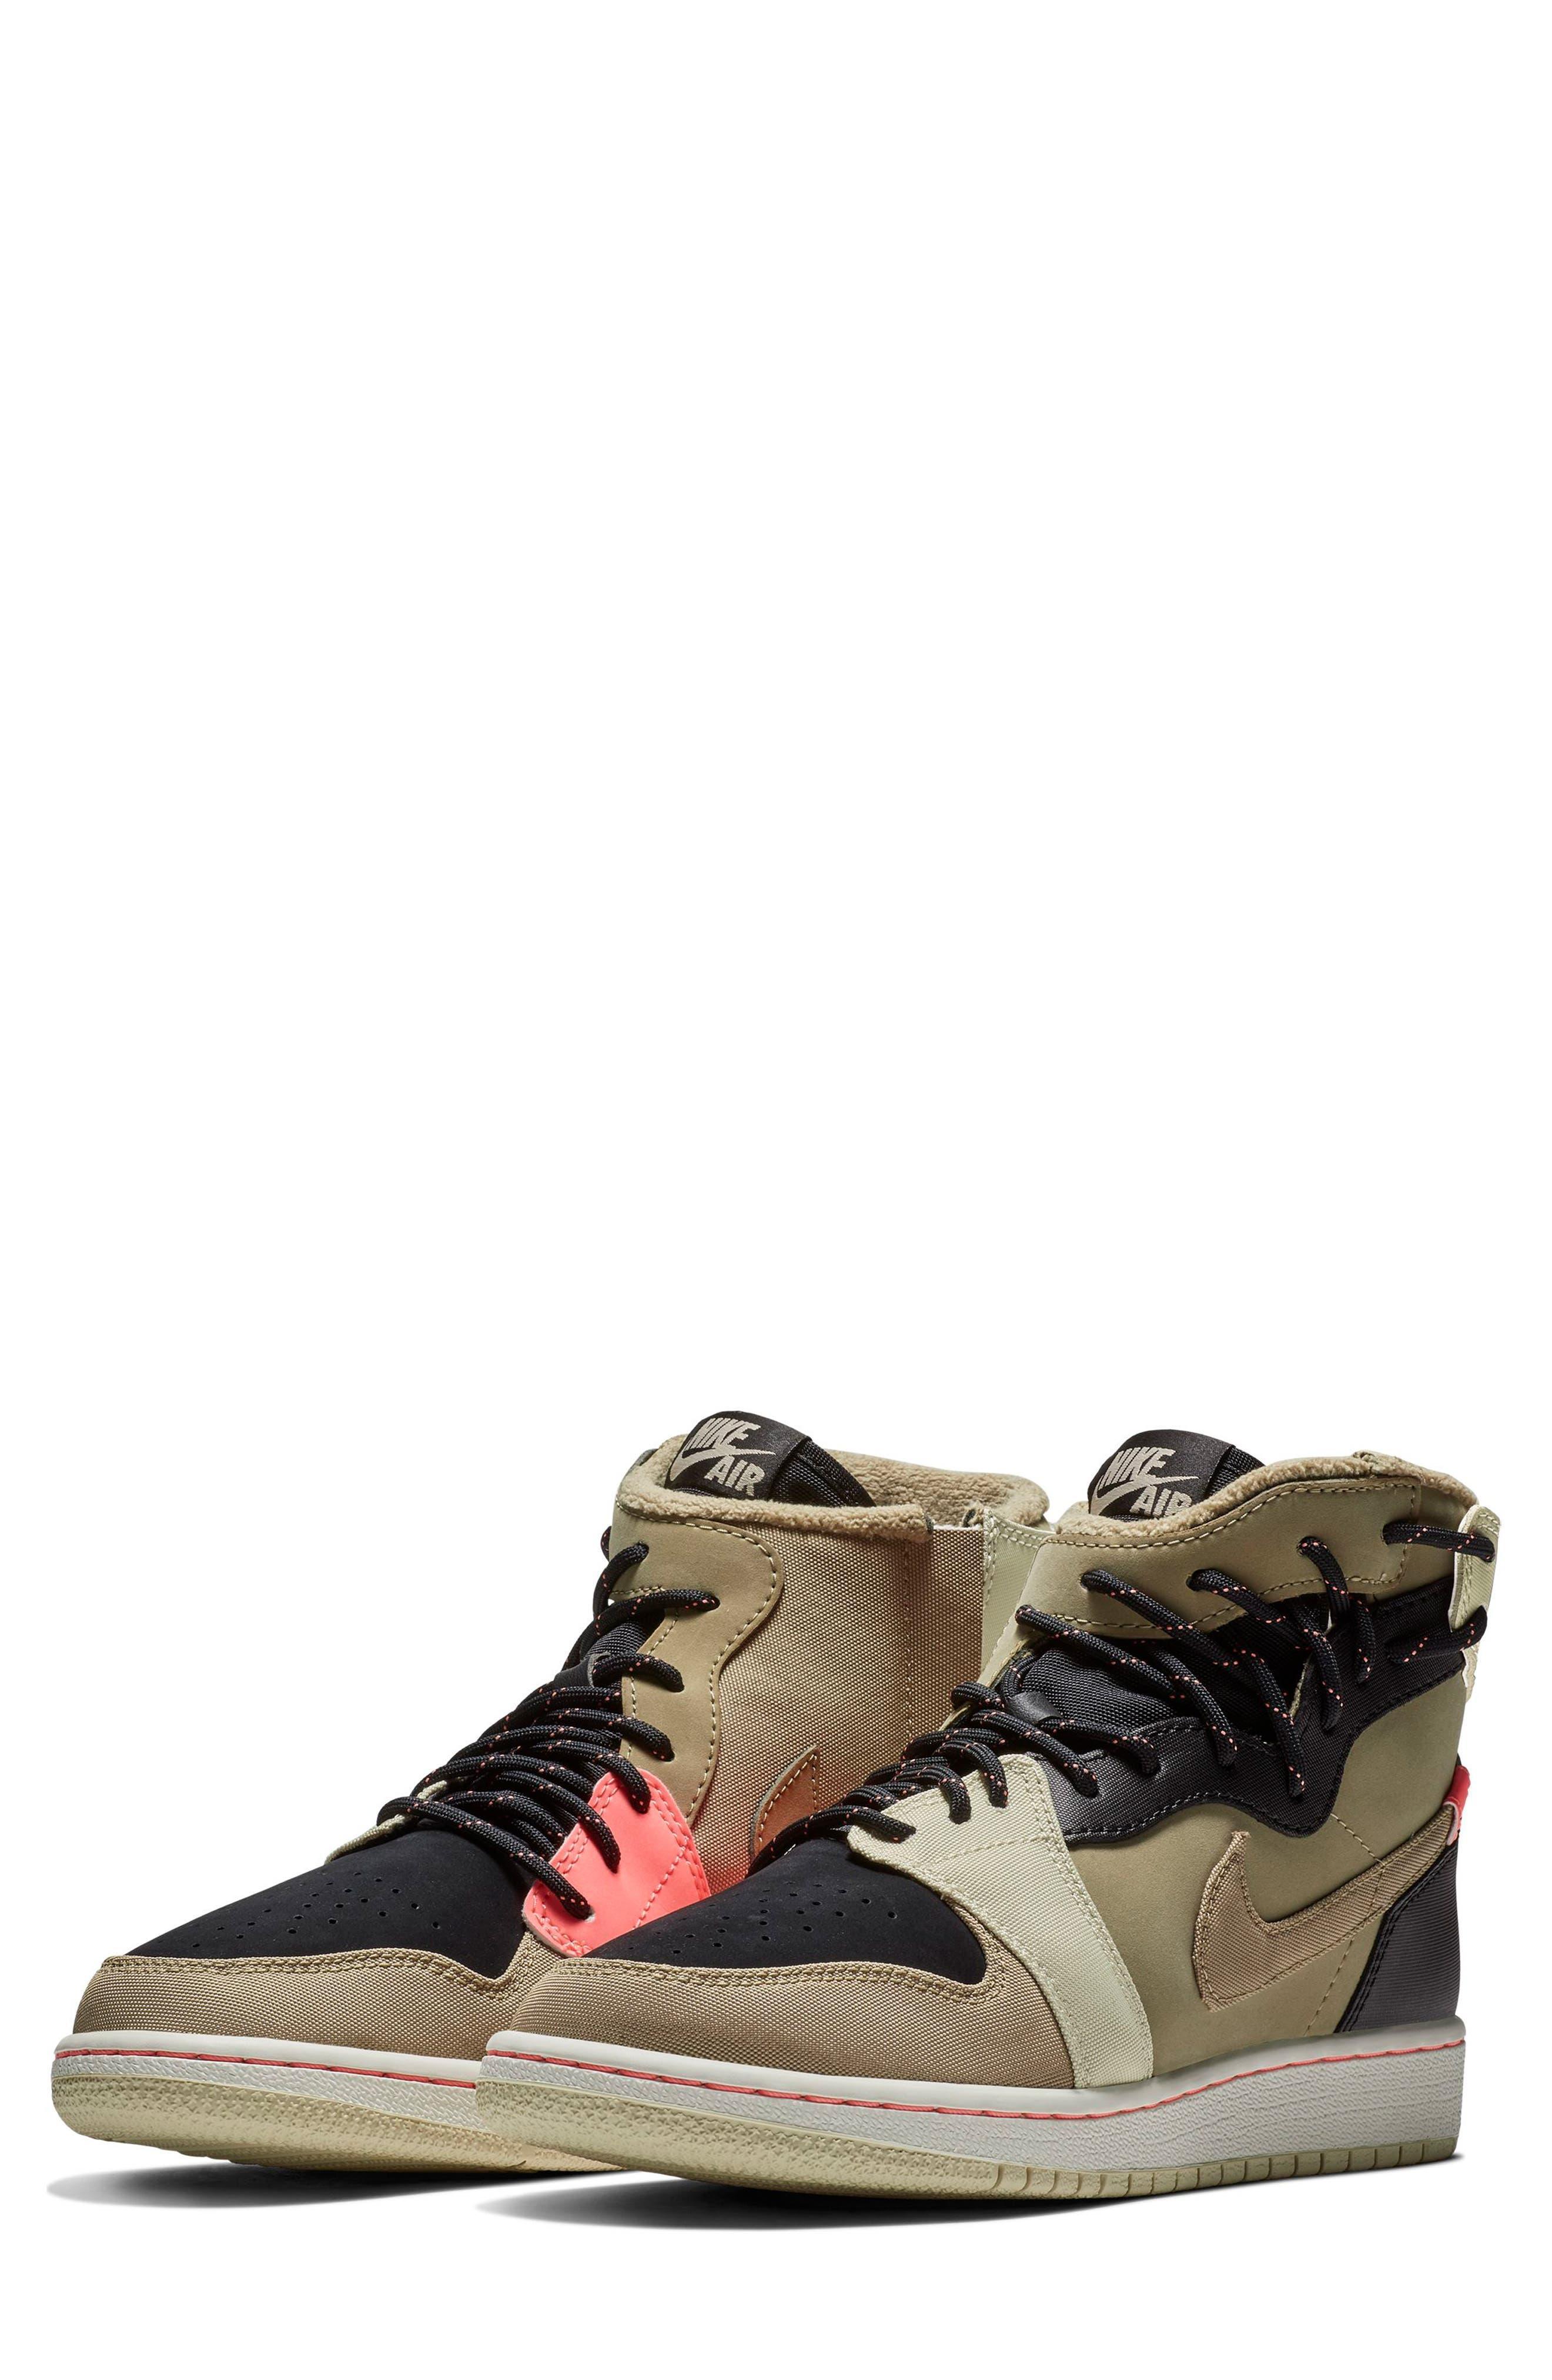 Air Jordan 1 Rebel XX Utility High Top Sneaker,                             Main thumbnail 1, color,                             PARACHUTE BEIGE